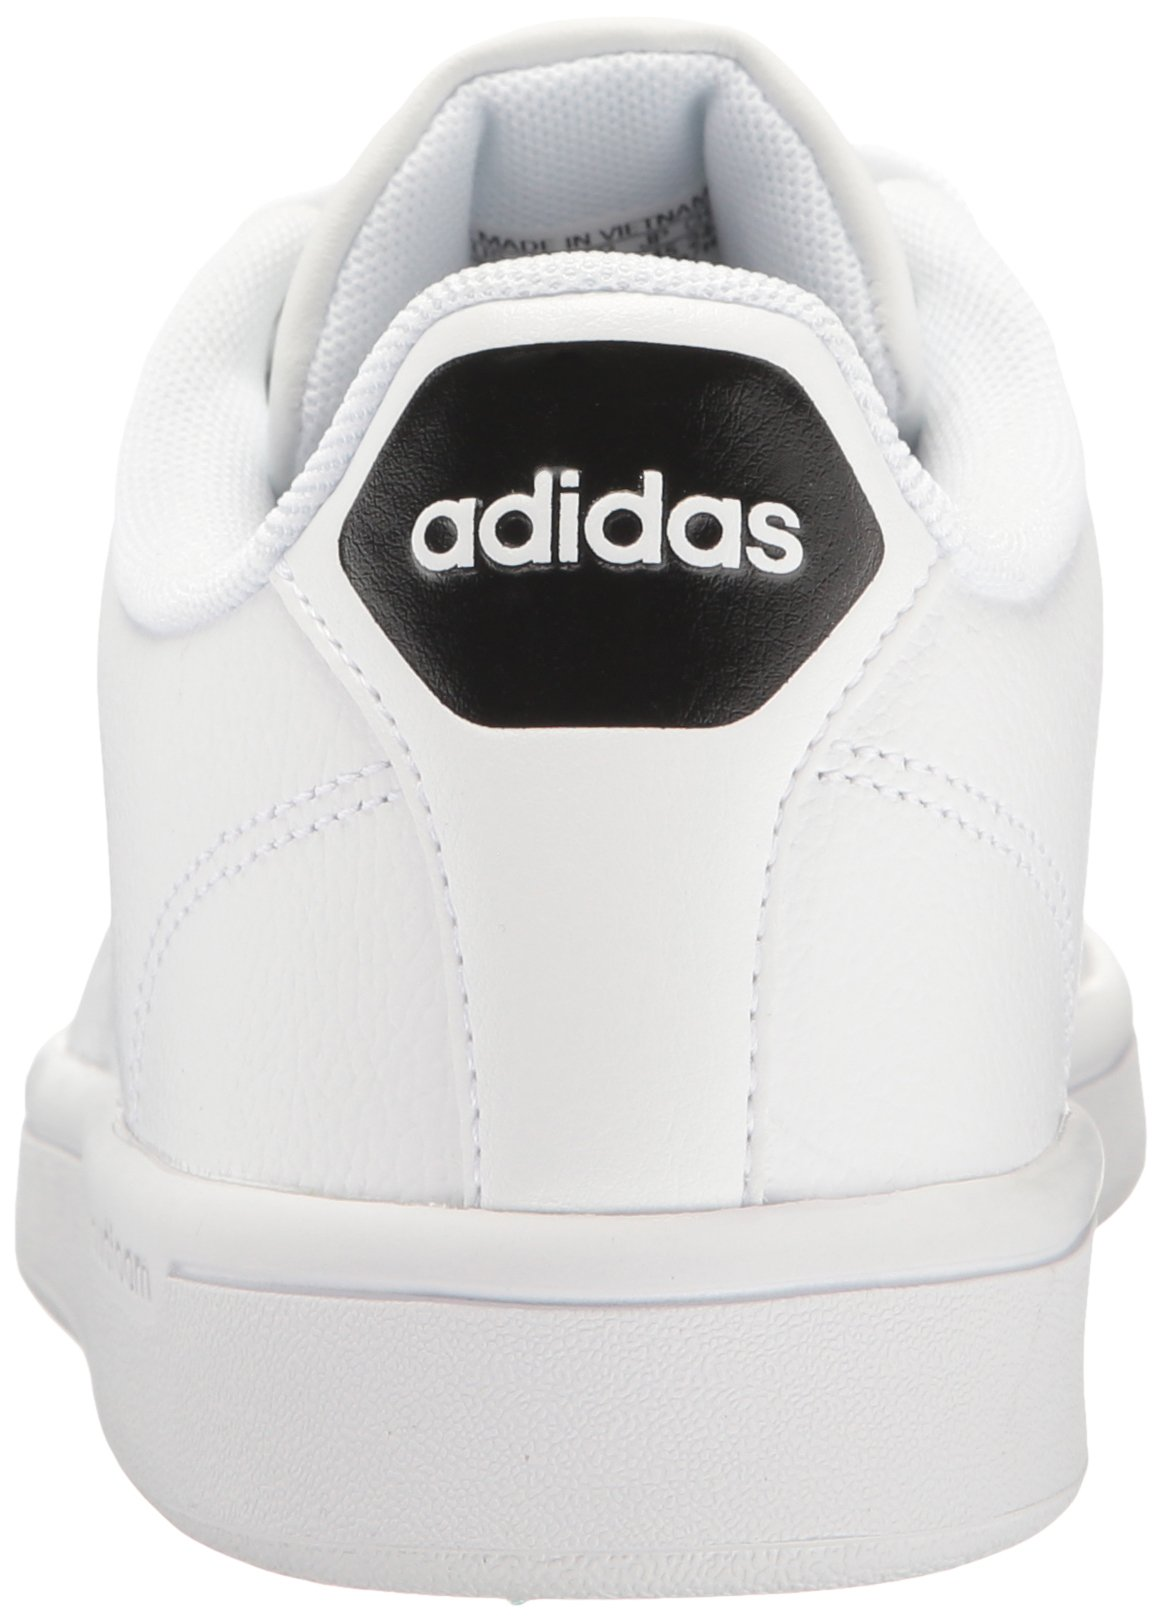 adidas Women's Shoes Cloudfoam Advantage Clean Sneakers, White/White/Black, (7.5 M US) by adidas (Image #2)